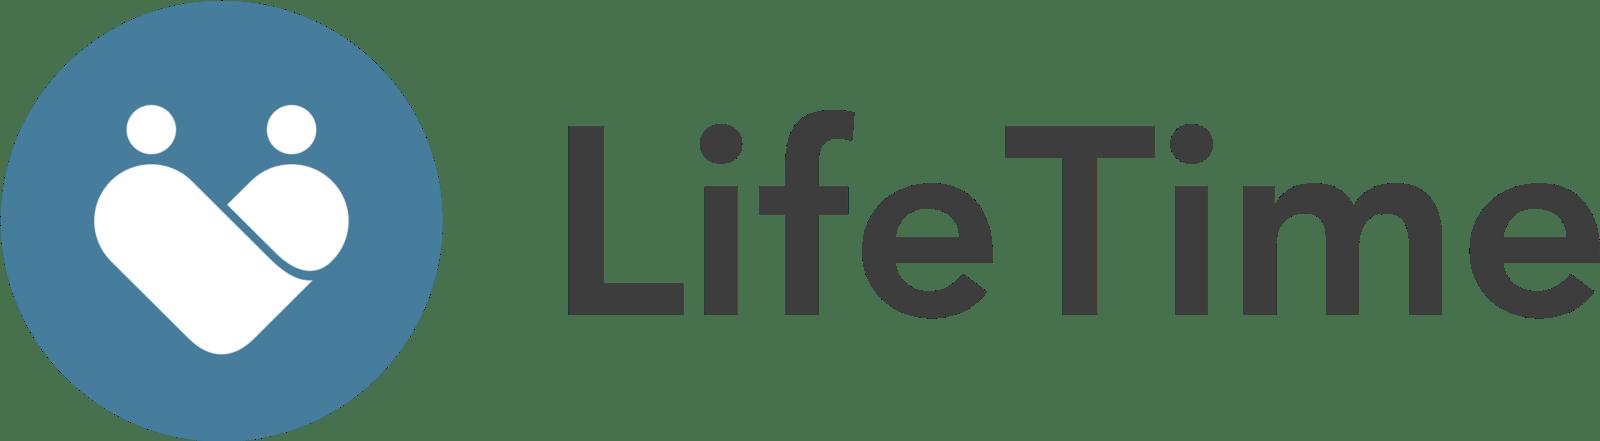 LifeTime company logo